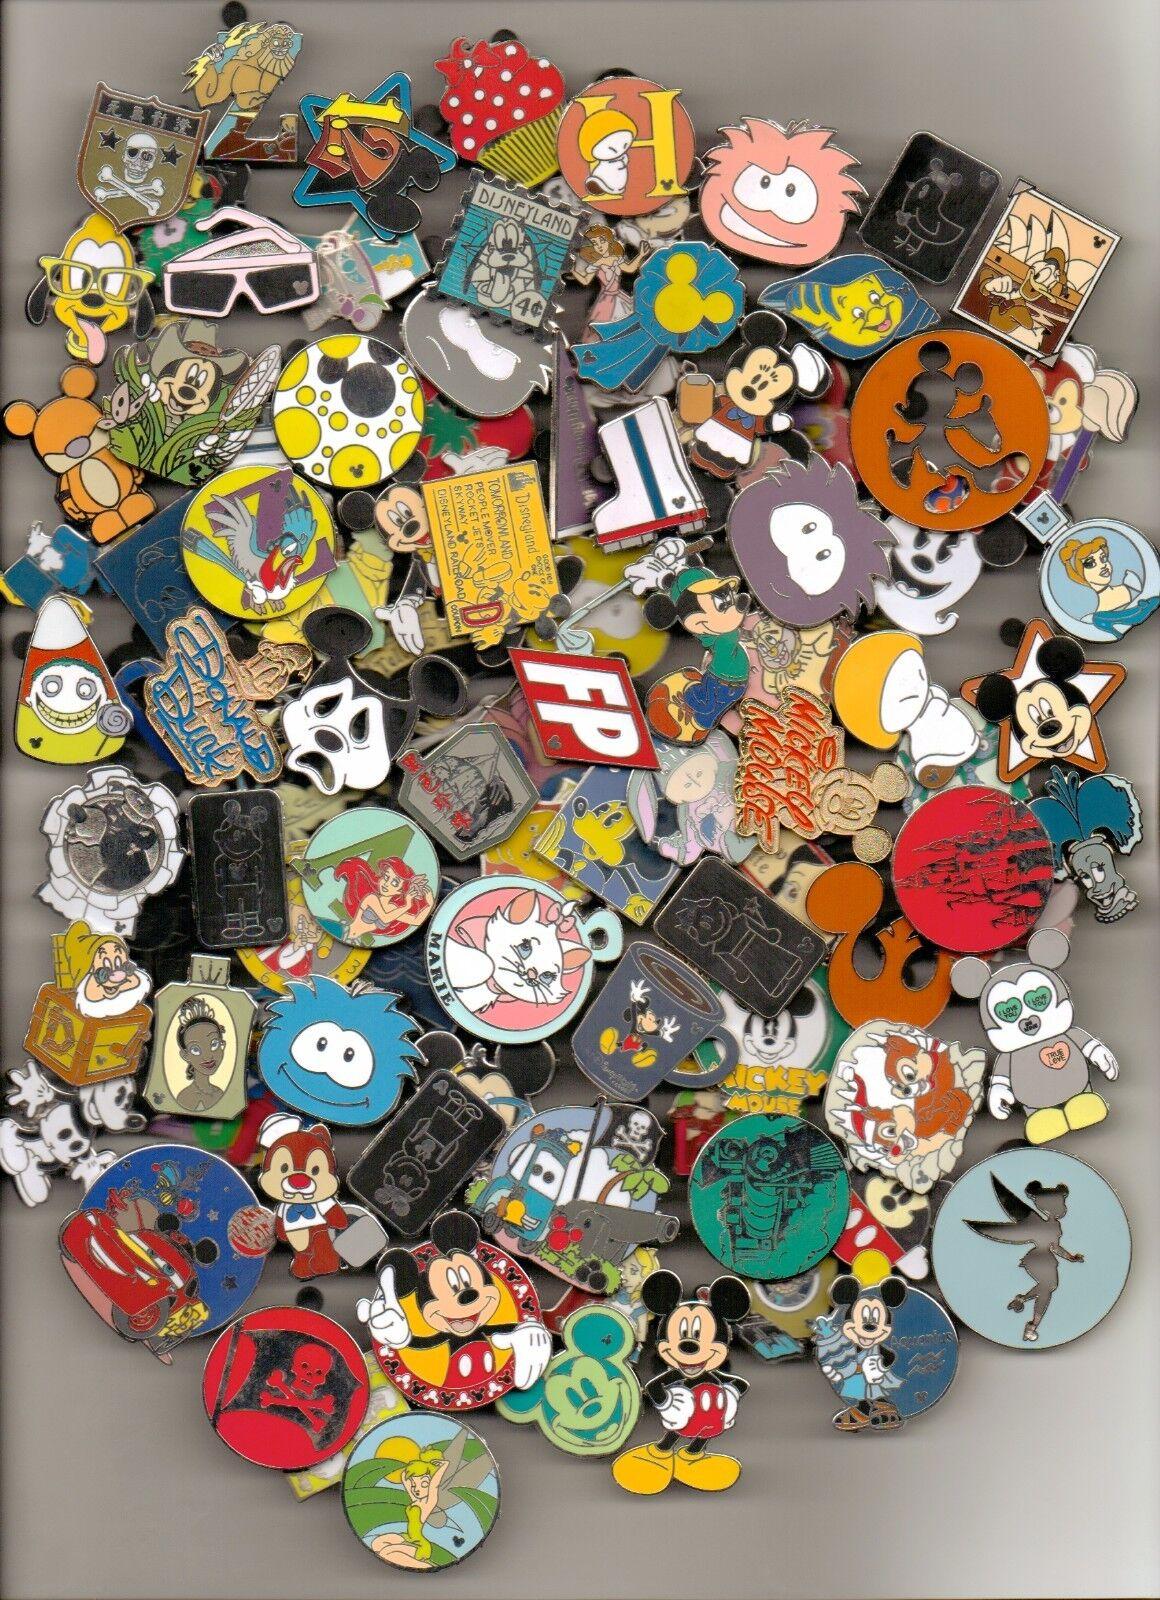 Disney Trading Pin 80 lot HM-RACK-LE-CAST NO DUPLICATES Fastest Shipper in USA